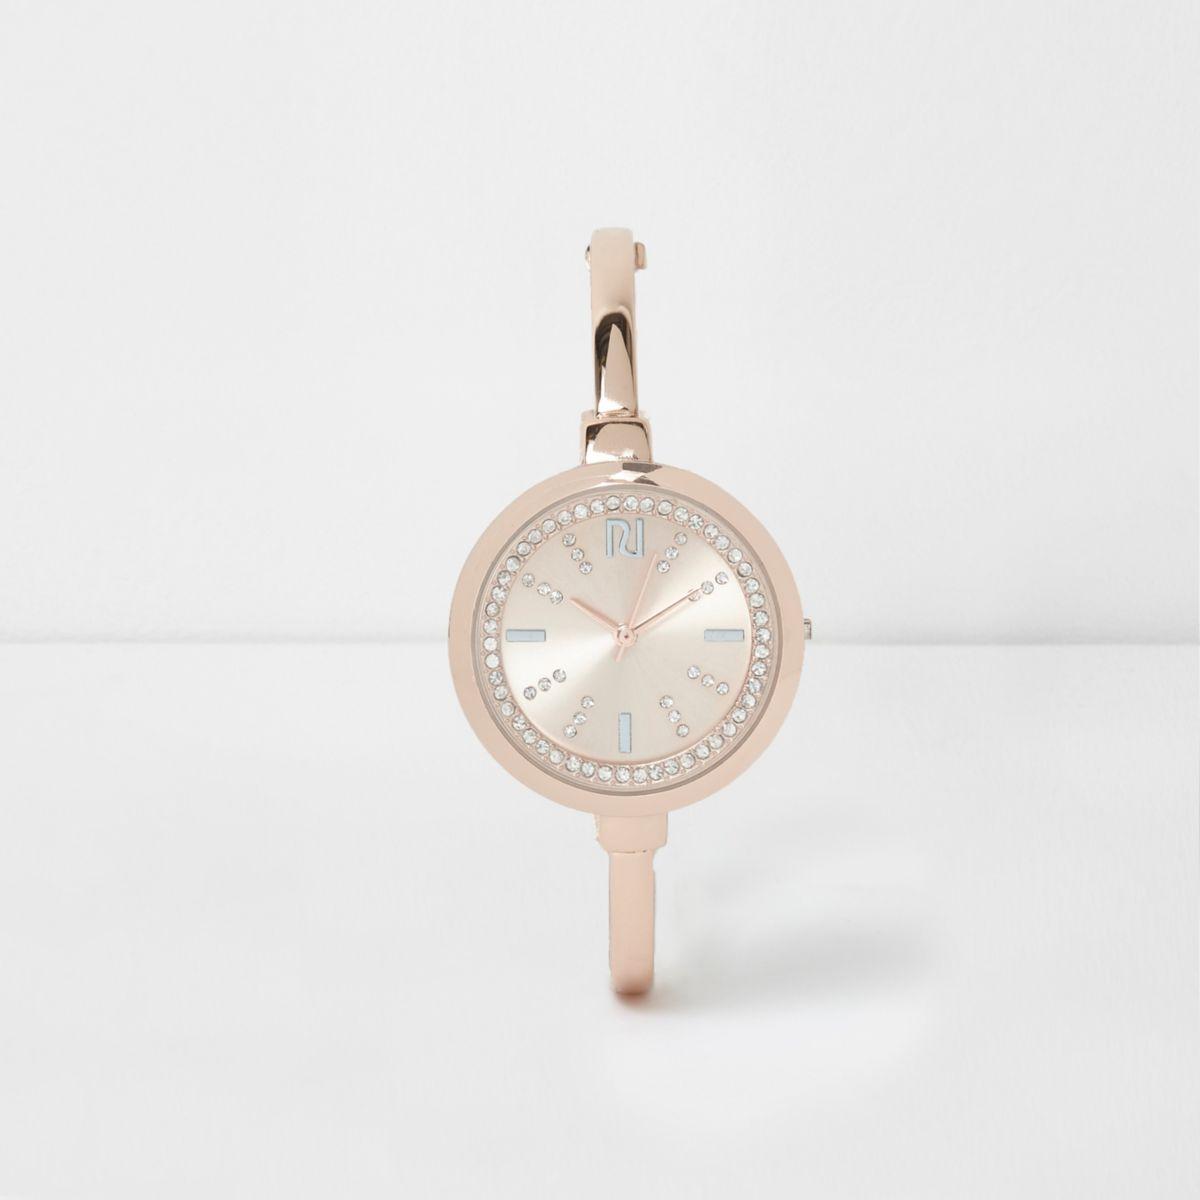 Rose gold tone rhinestone round watch